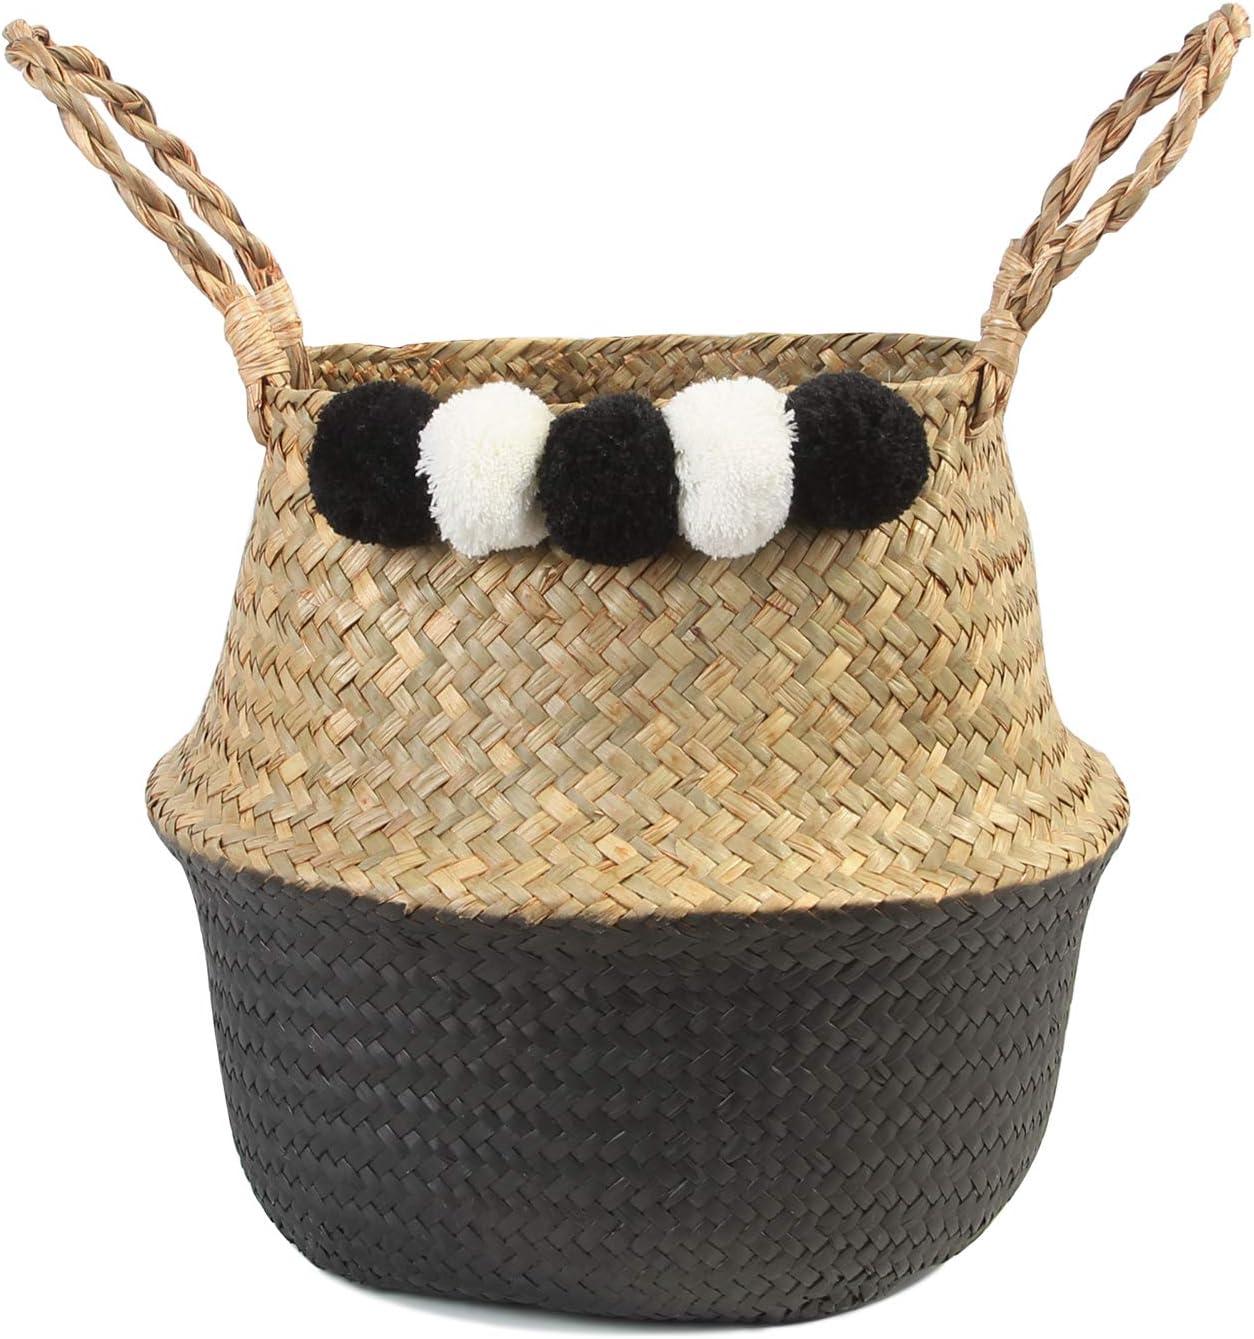 BlueMake Woven Seagrass Belly Basket for Storage Plant Basket or Toy Basket Living Bathroom (Medium, White and Black)